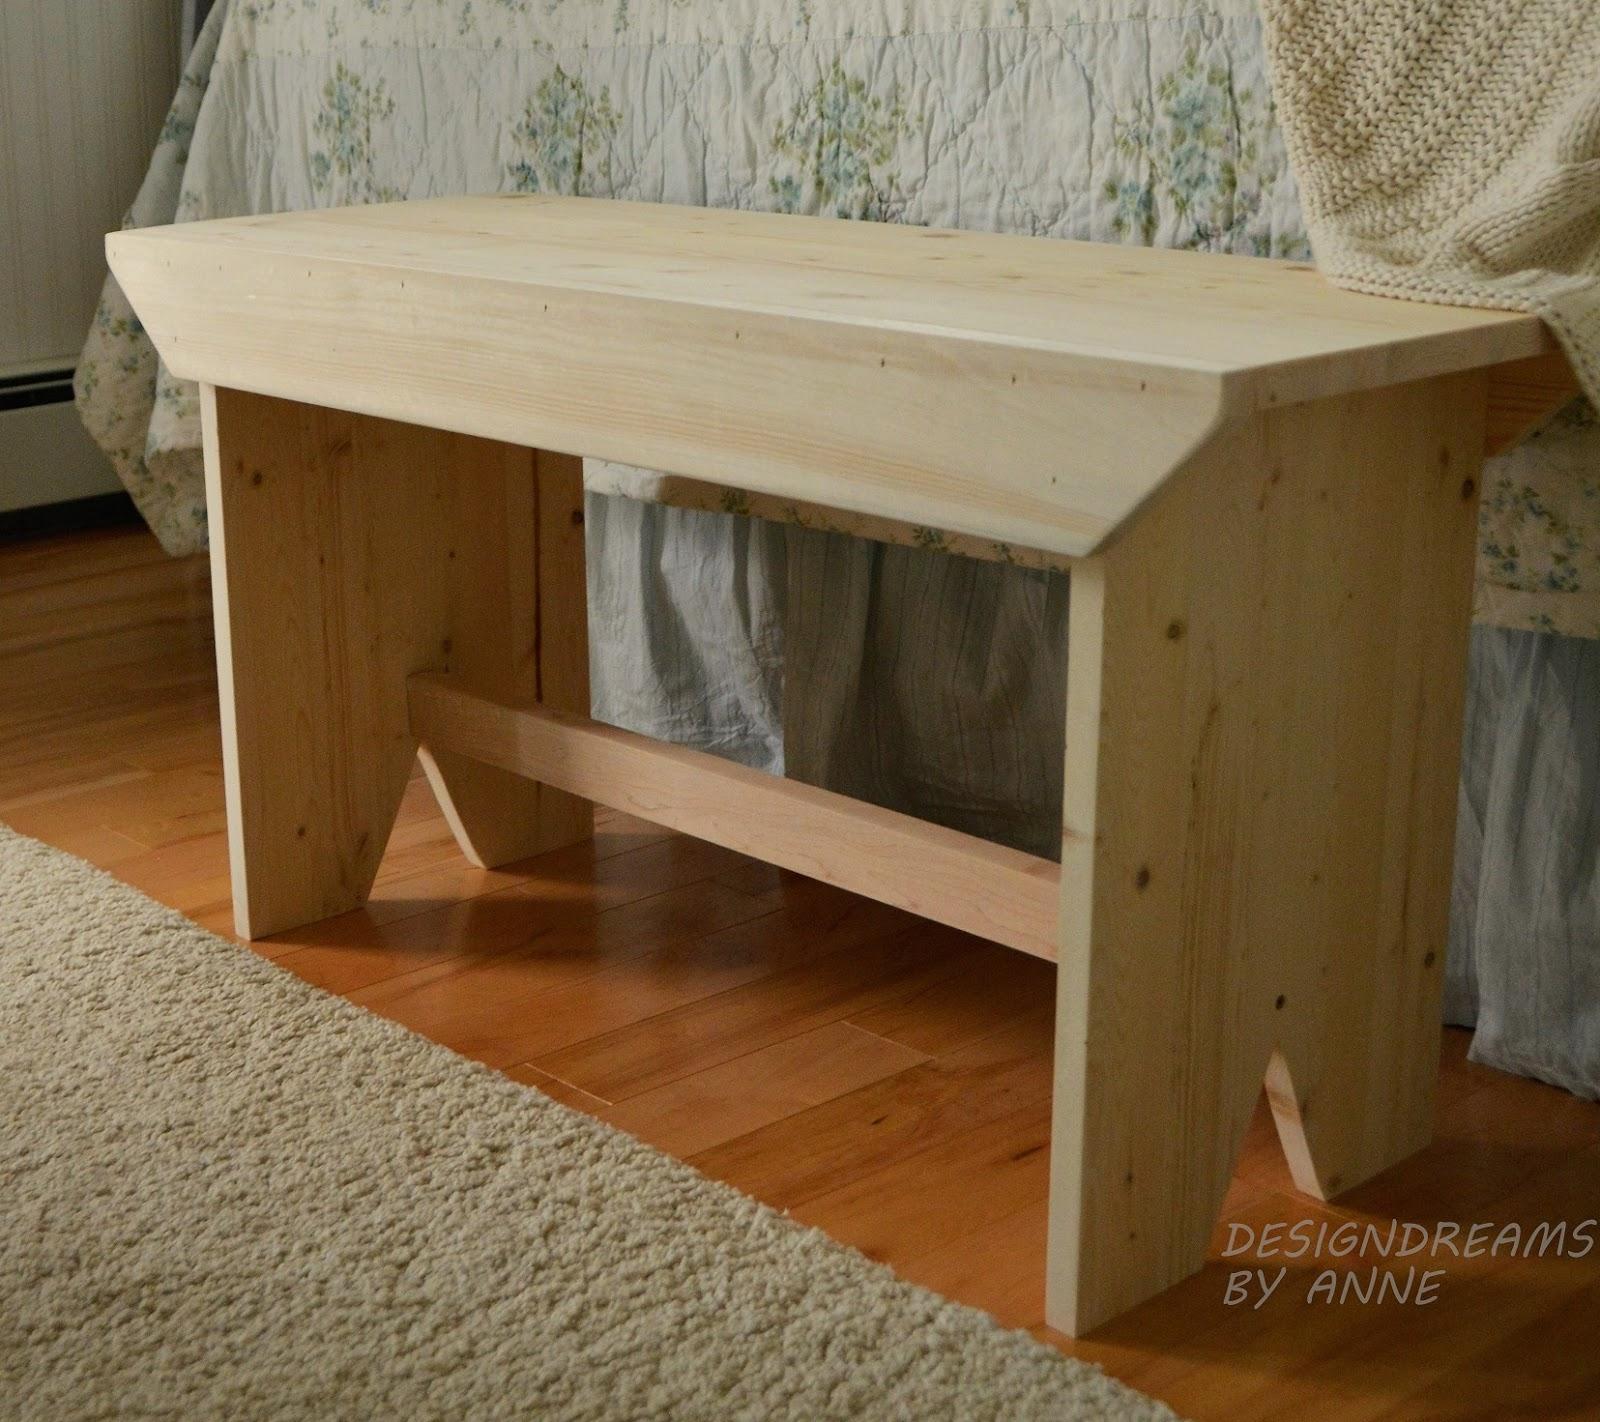 bedinback unfinished stabbedinback foyer ideas hd home fabulous entryway within bench wooden